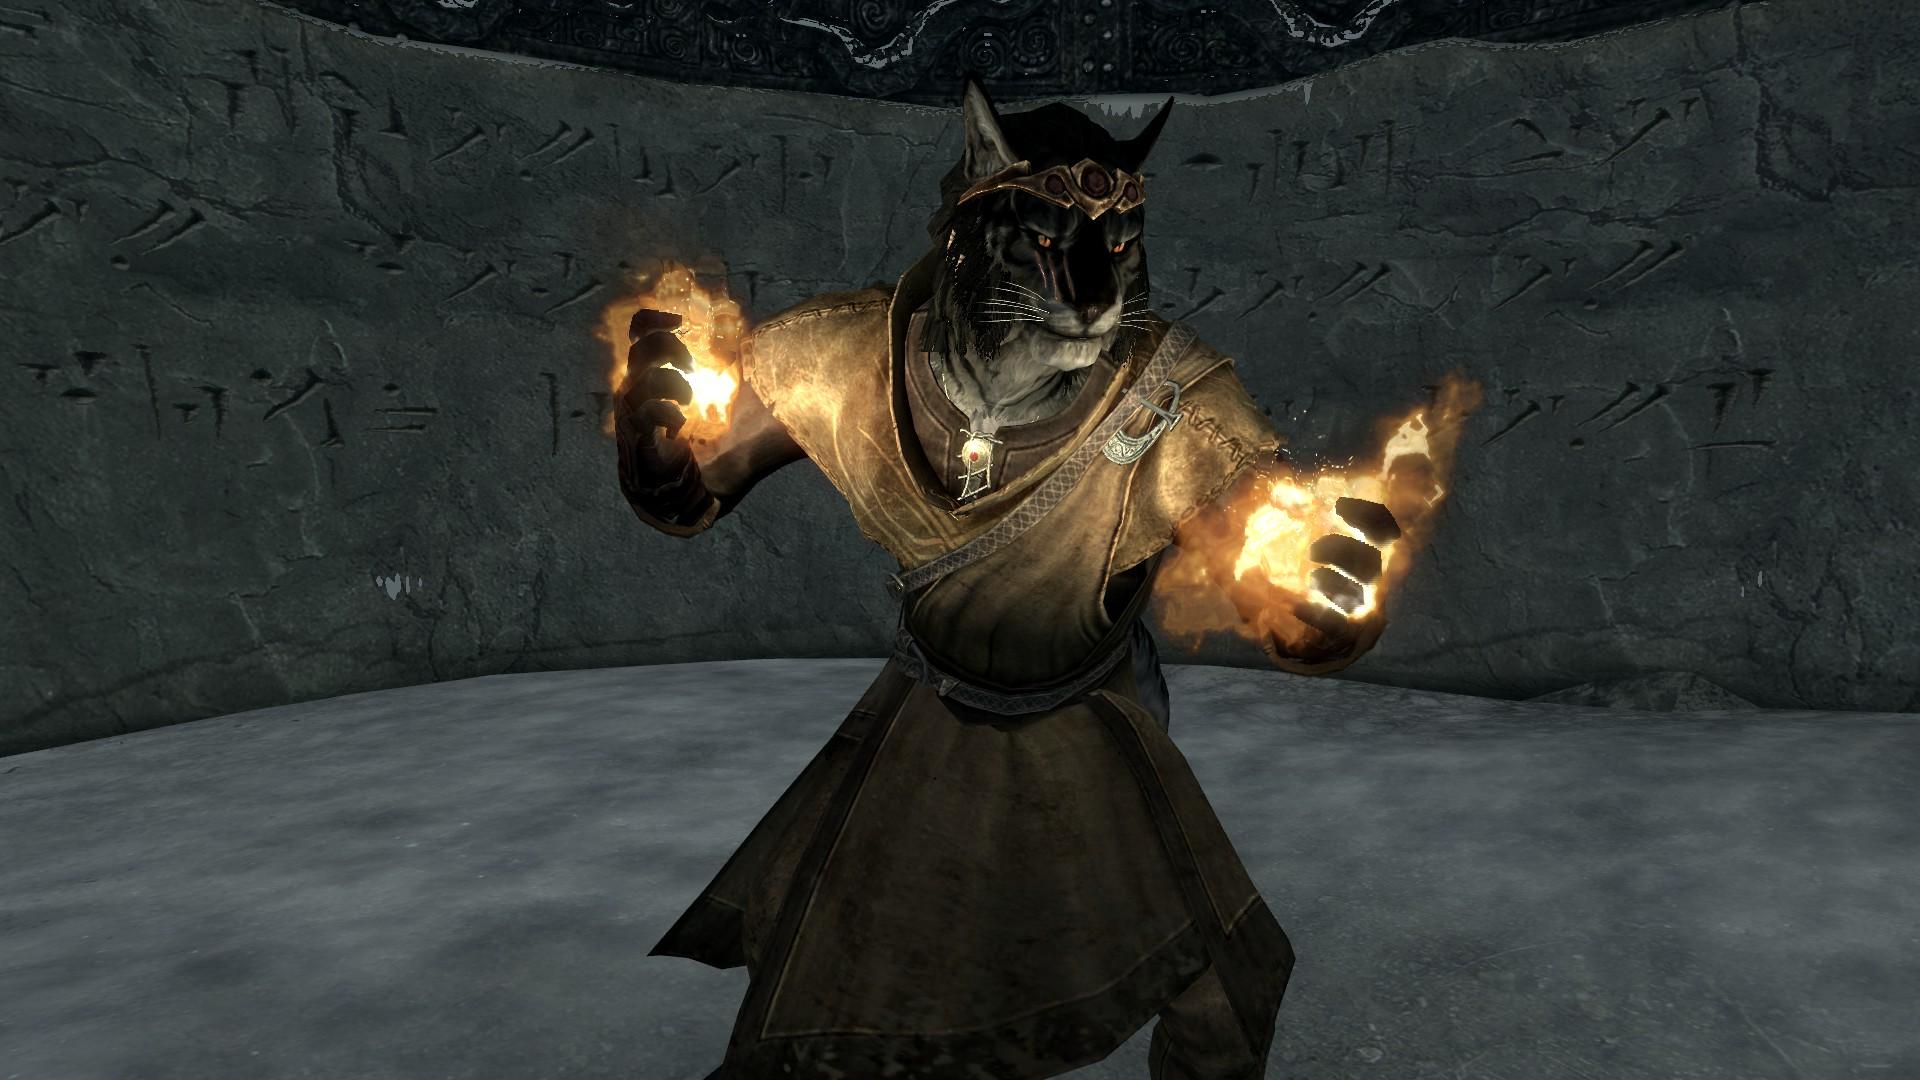 Elder Scrolls Black Cat